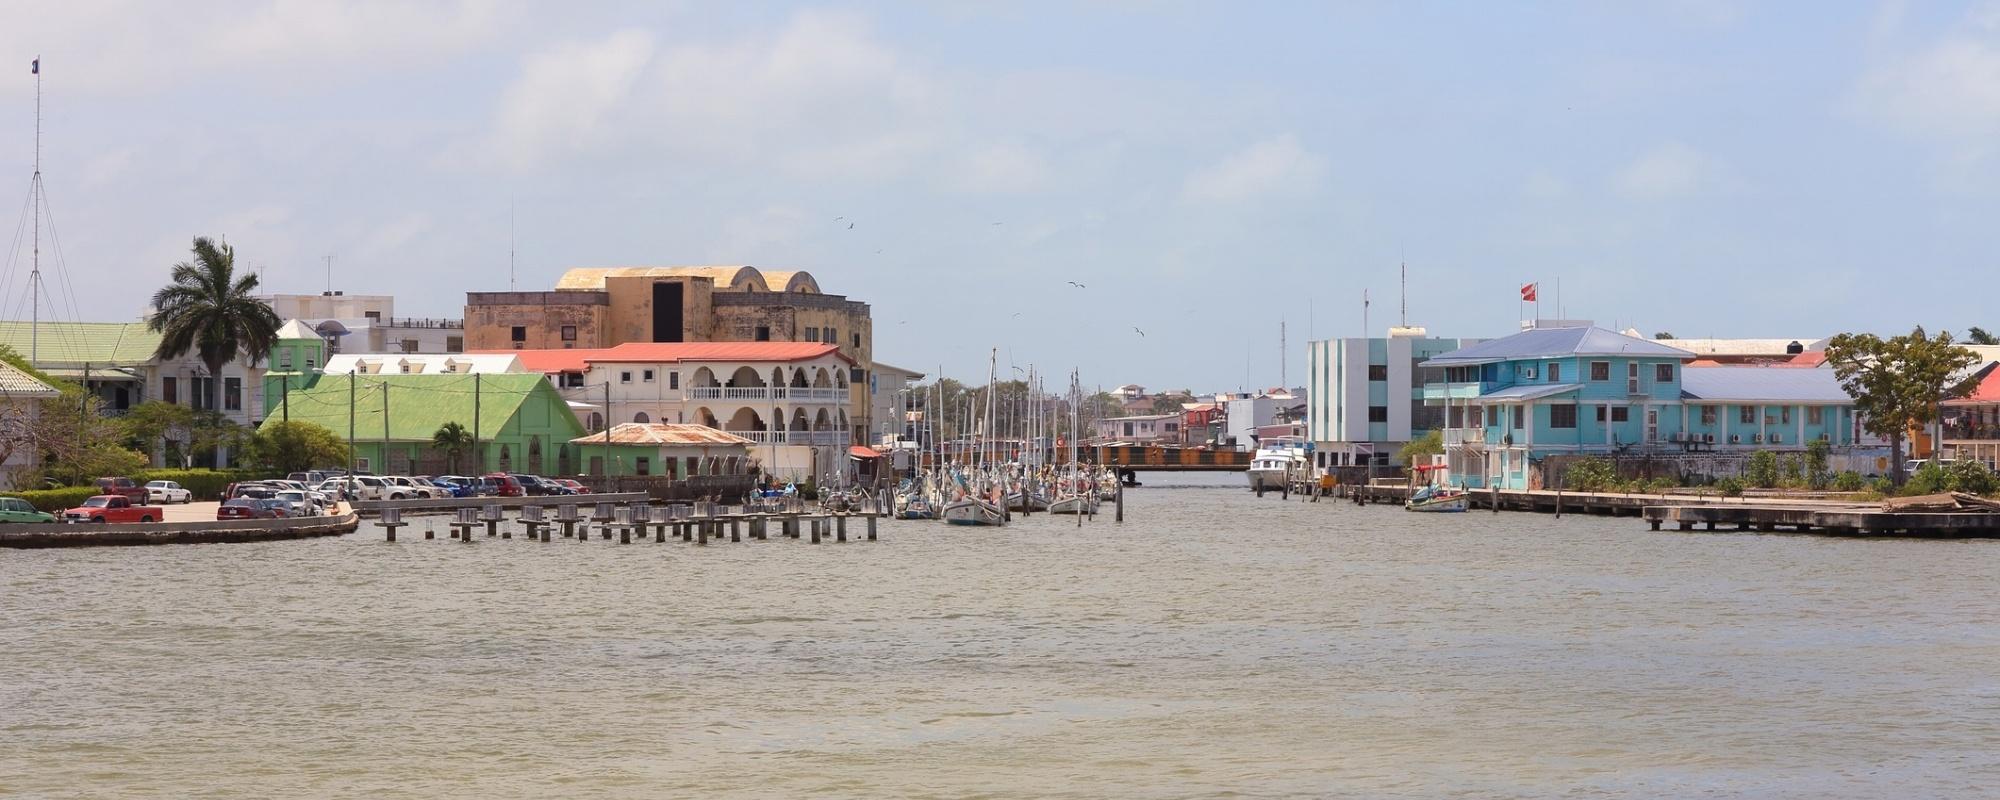 Business & Economy of Belize